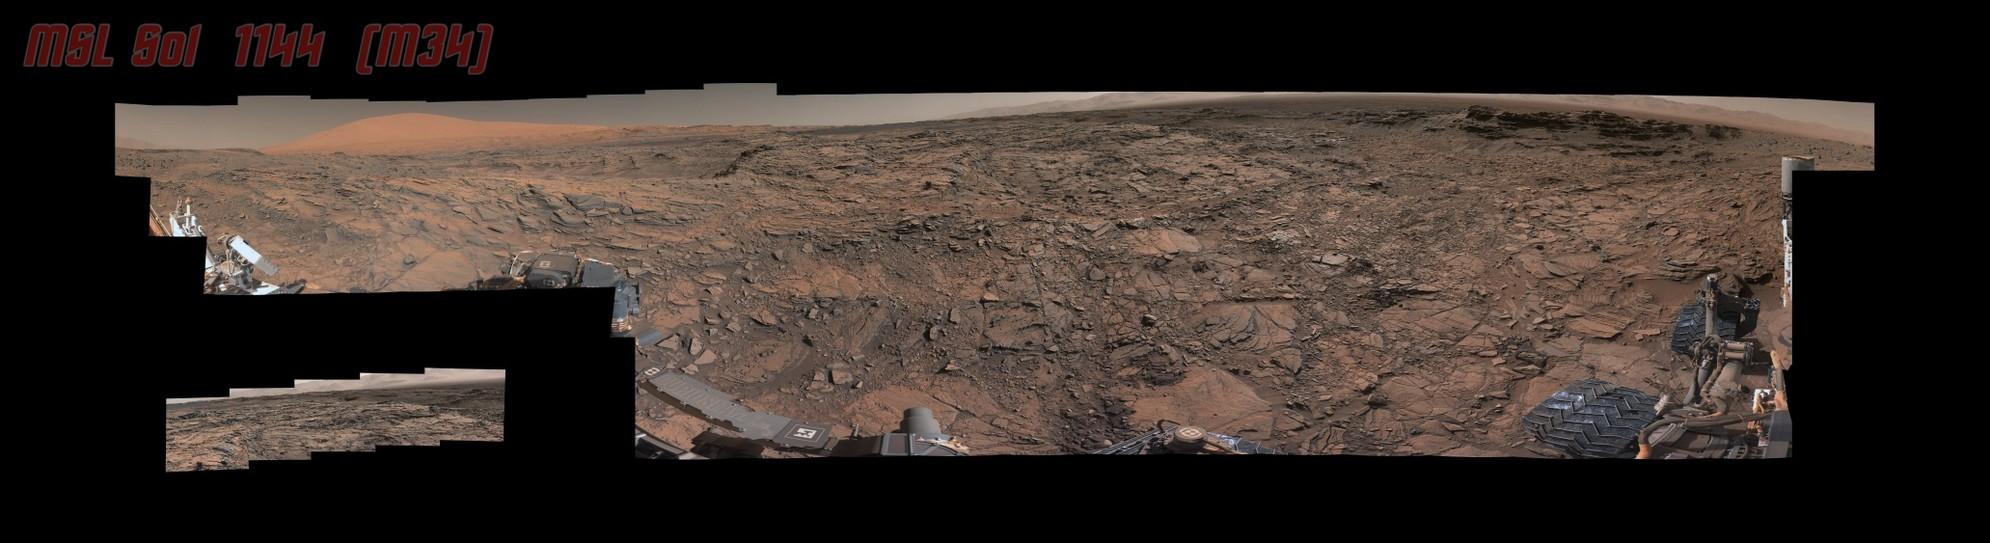 MSL Curiosity Rover - Sol 1144 Left Mastcam (M-34) Pds Composite